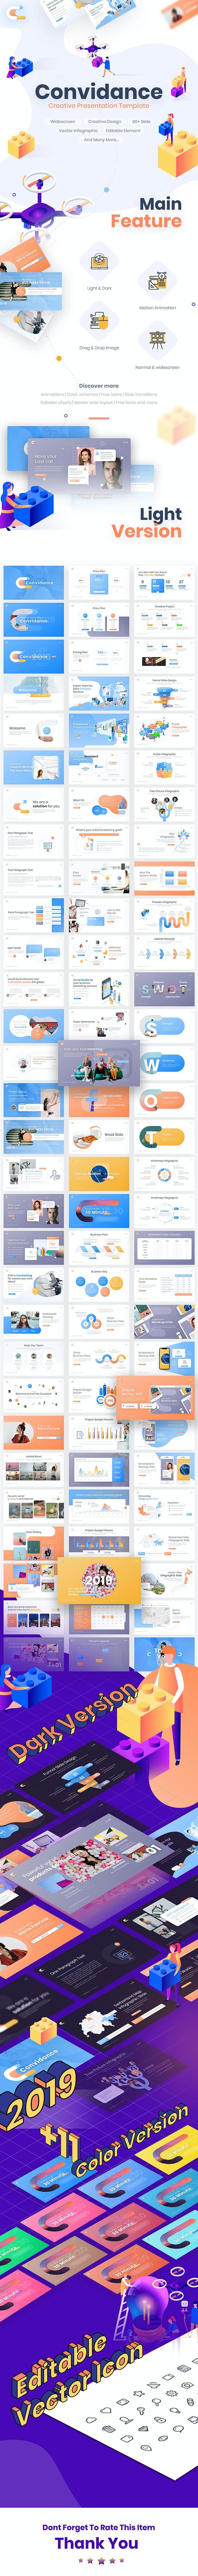 Convidance Creative PowerPoint Template - PowerPoint Templates Presentation Templates